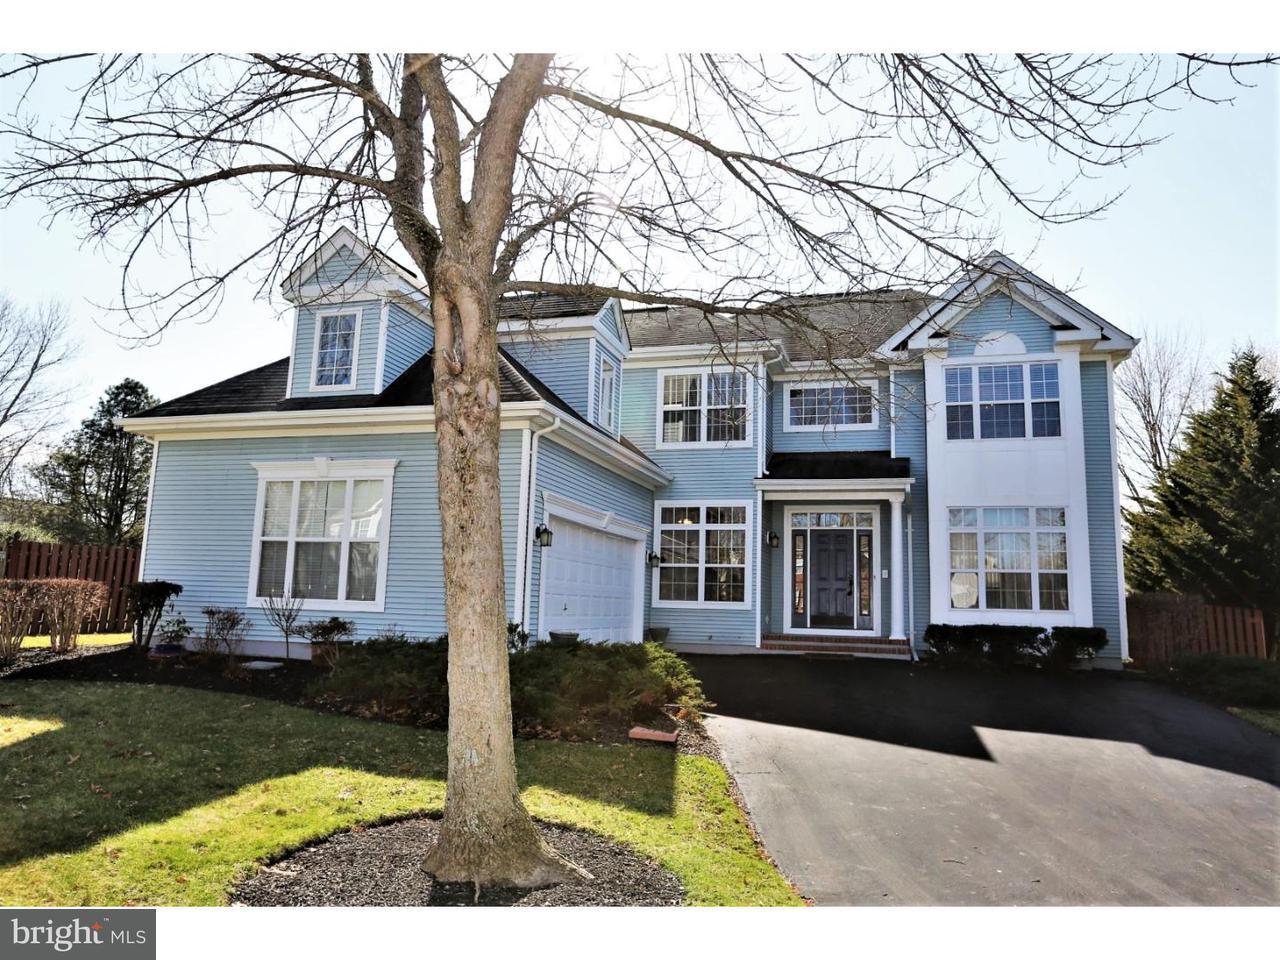 Casa Unifamiliar por un Venta en 6 BARN SWALLOW Court Plainsboro, Nueva Jersey 08536 Estados UnidosEn/Alrededor: Plainsboro Township